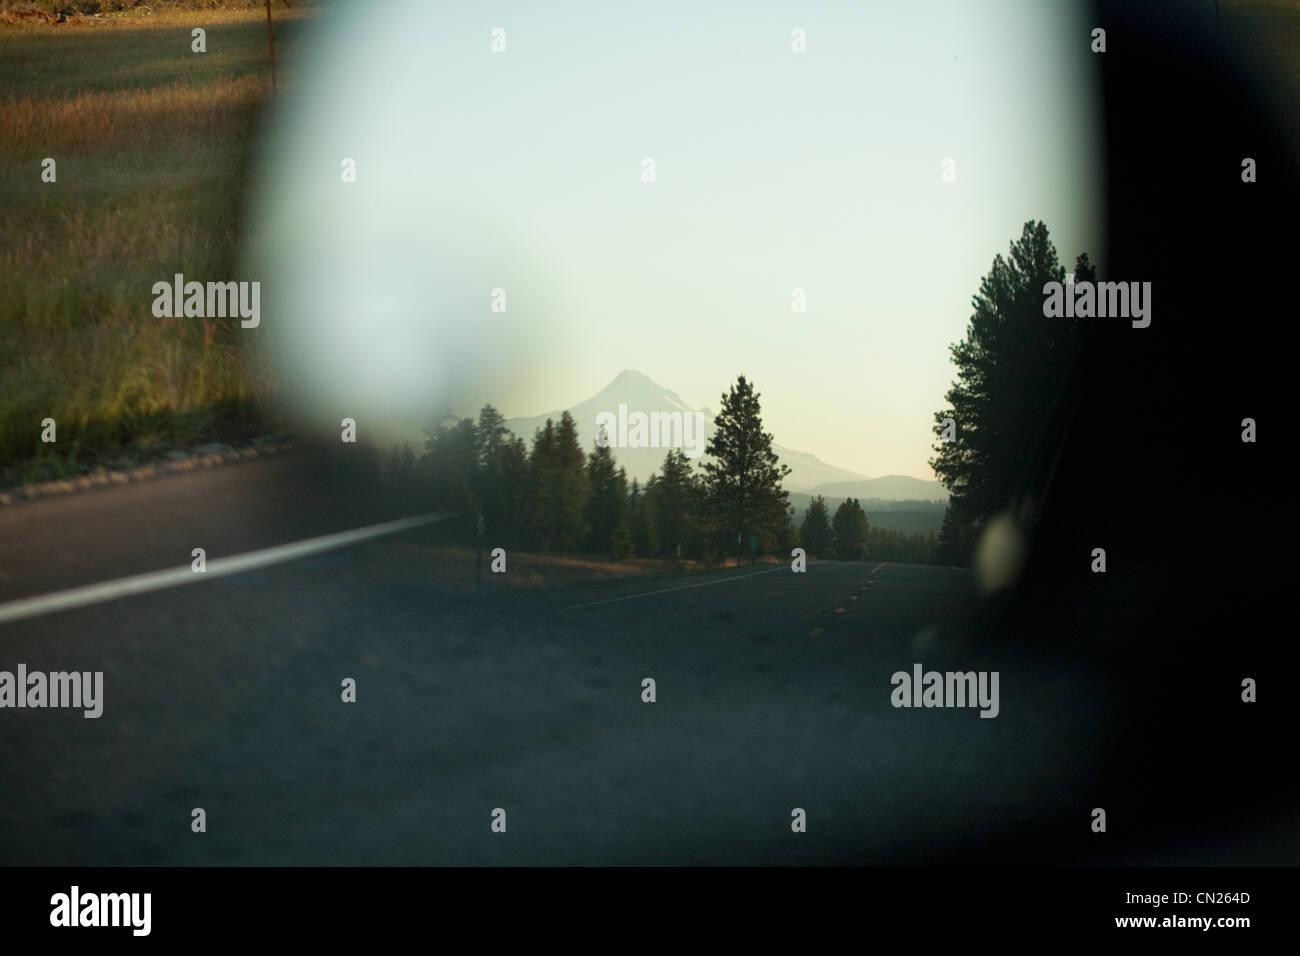 Mount Hood vu en miroir de voiture, Portland, Oregon Photo Stock